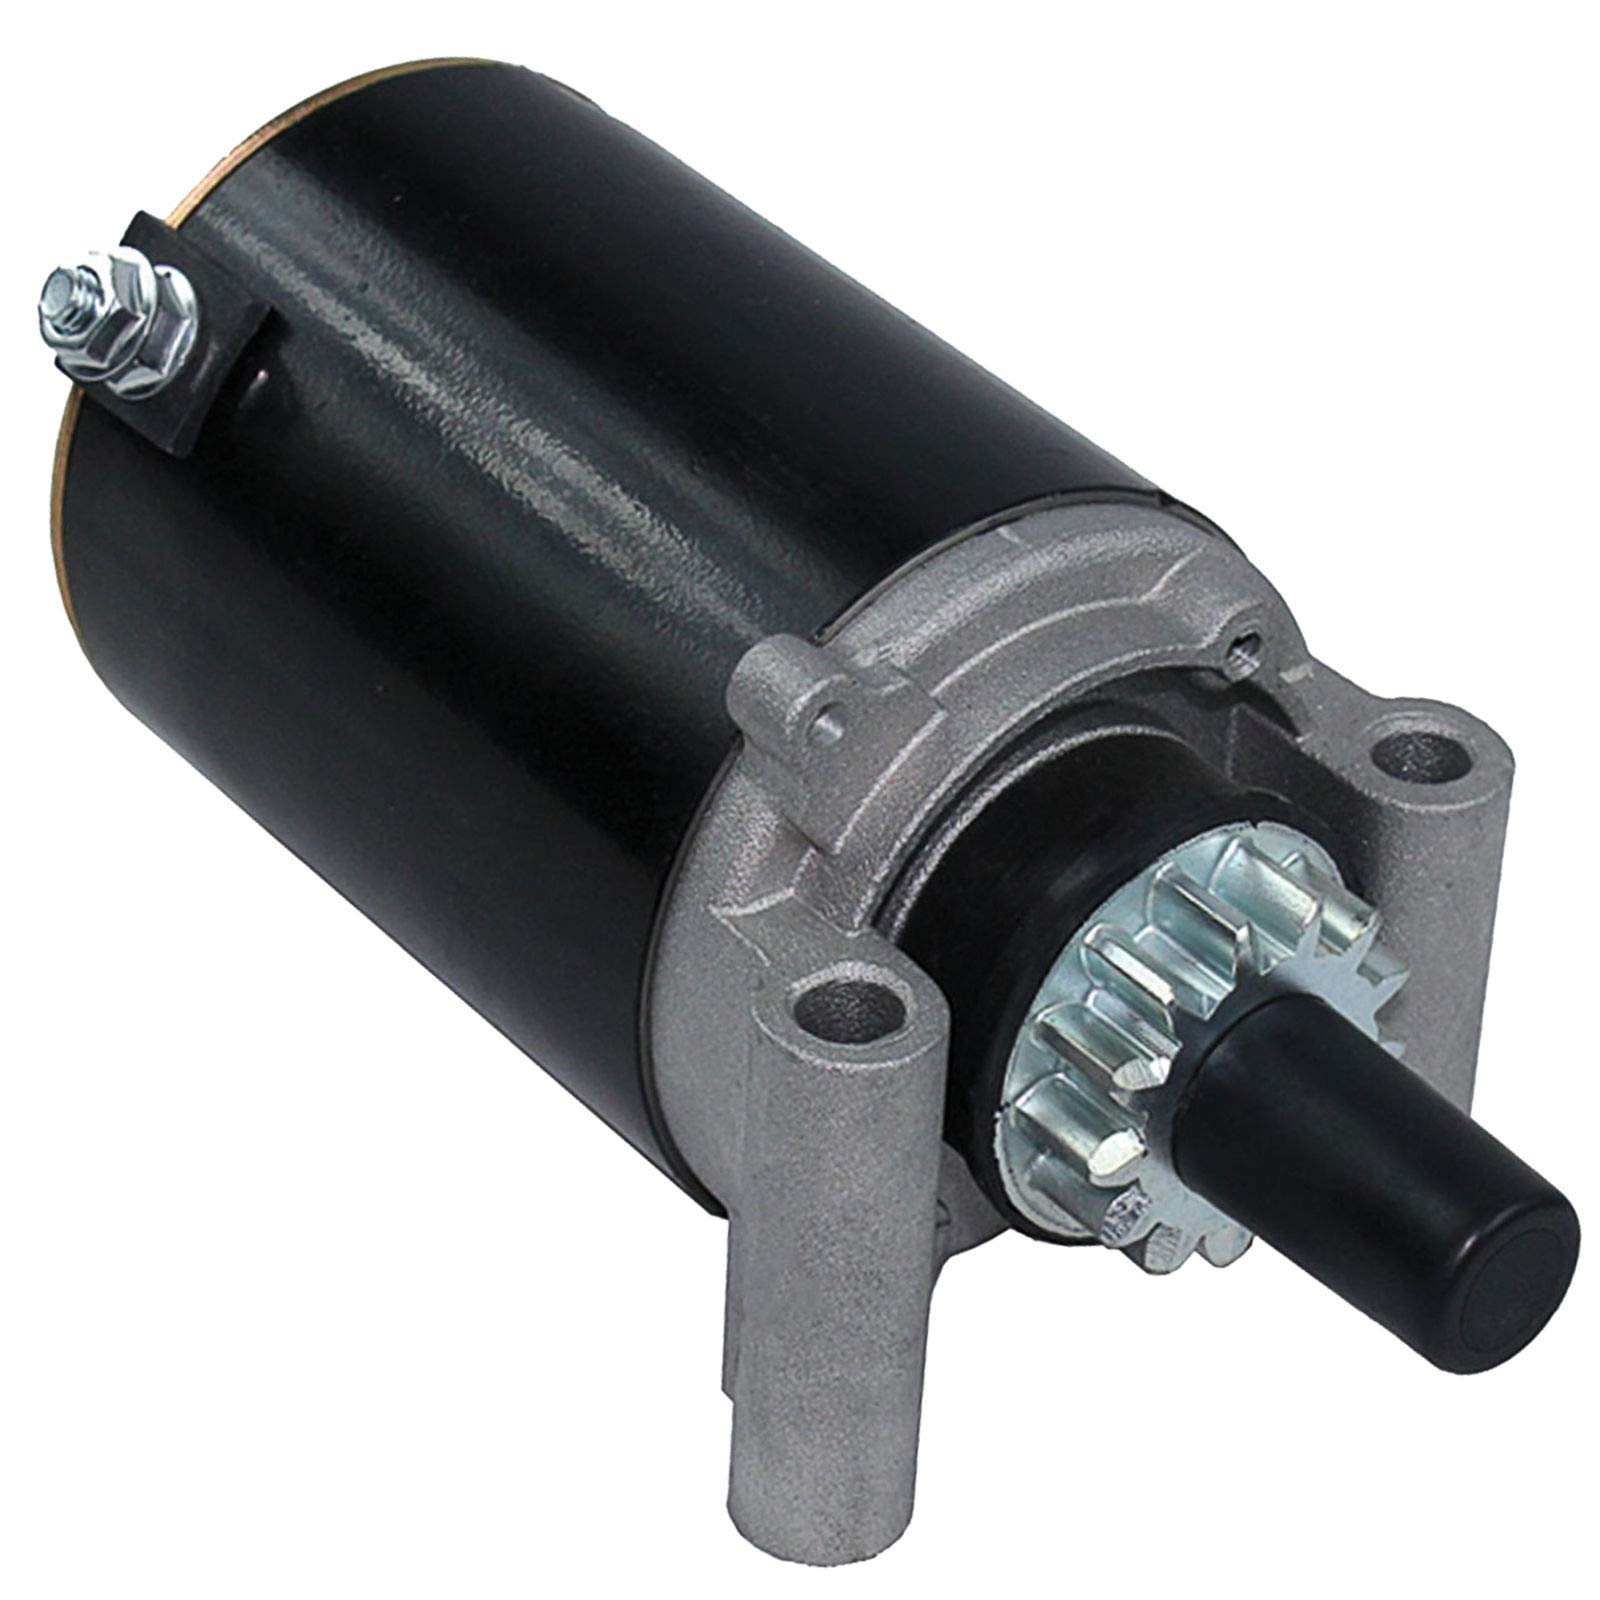 Caltric STARTER Fits JOHN DEERE 13 13HP 15 15HP 16 16HP LT133 LT150 LT155 LTR155 LT160 All NEW by Caltric